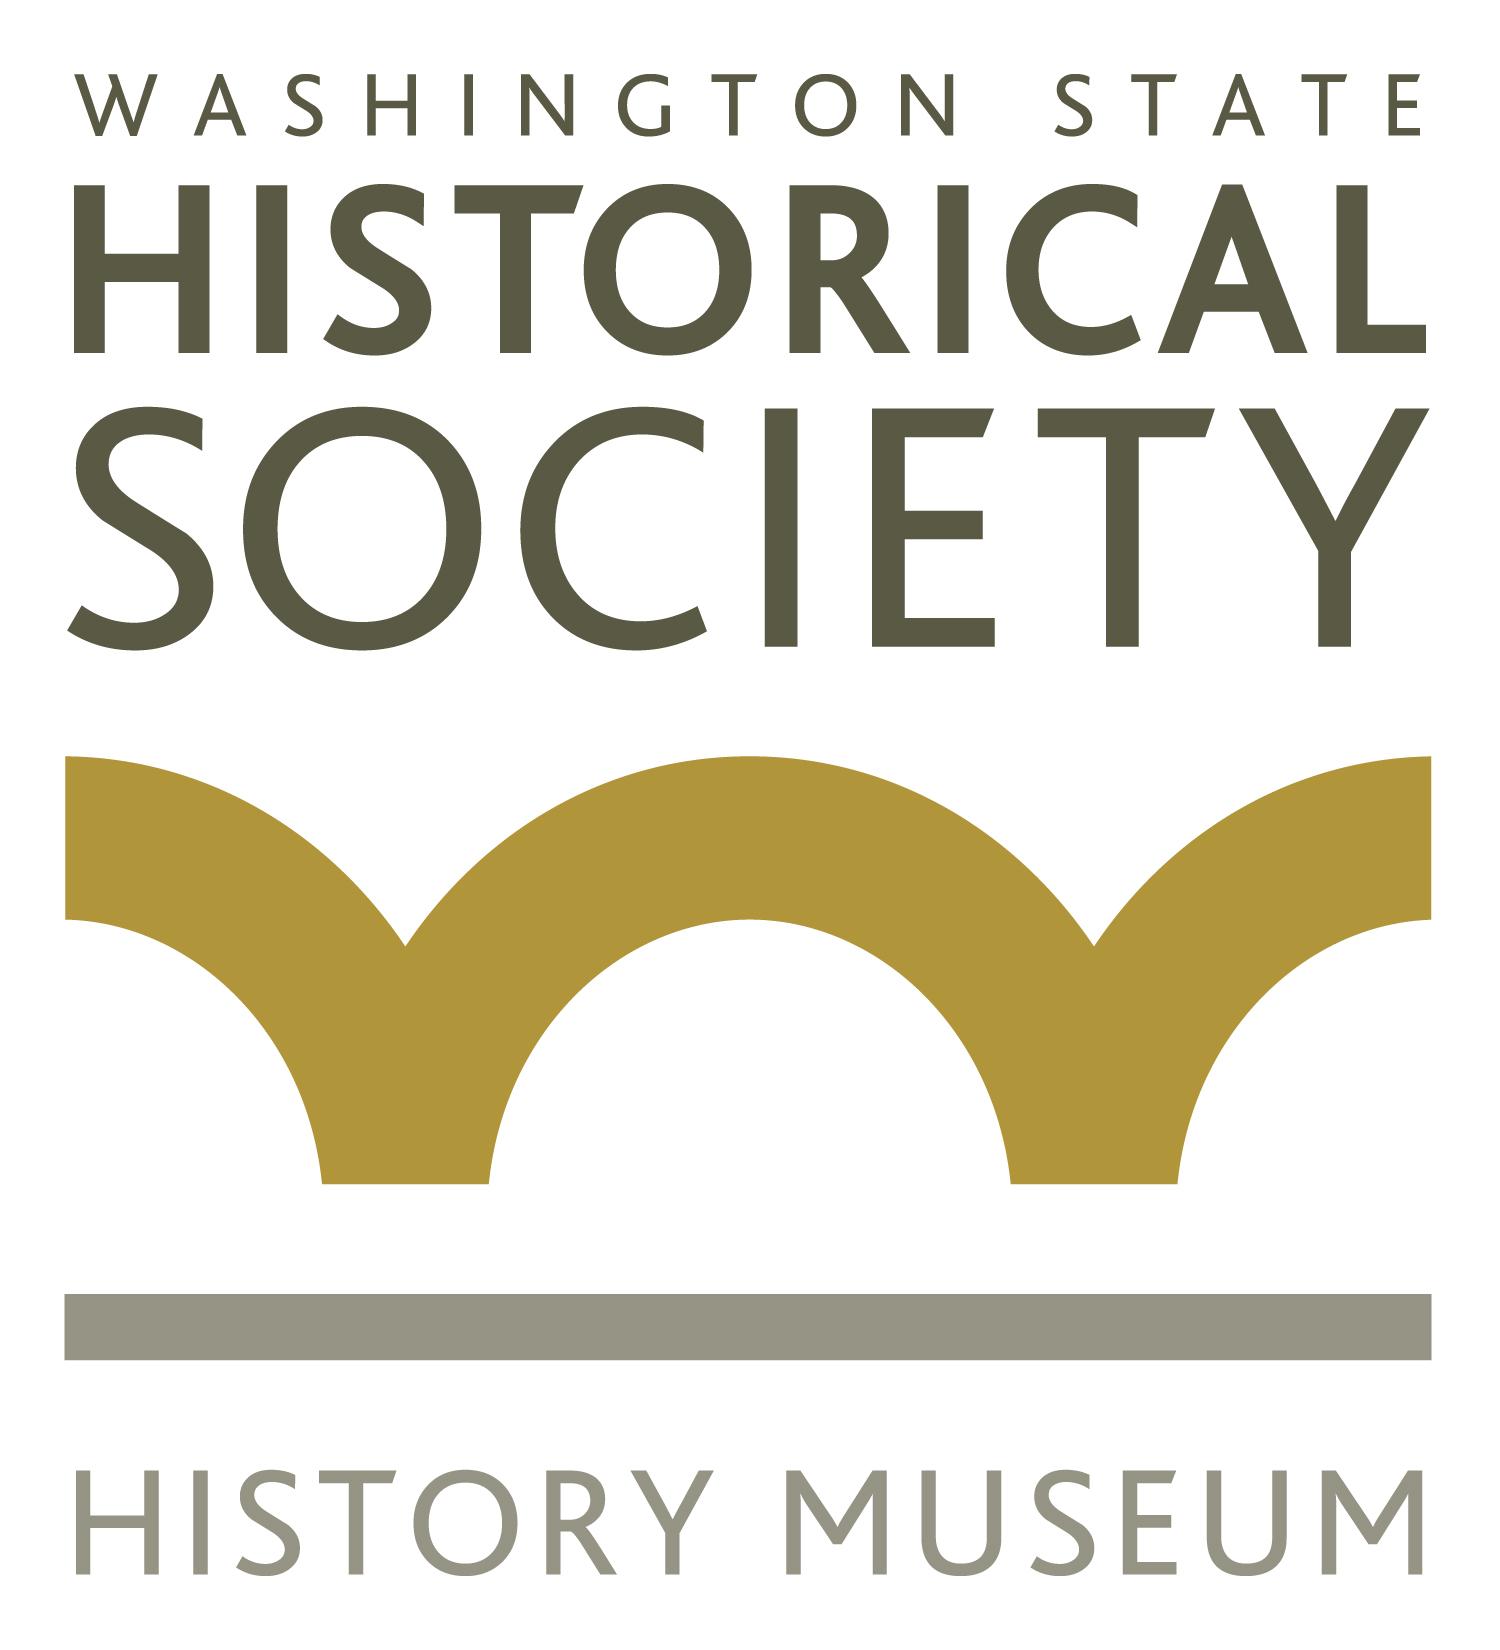 Washington State Historical Society